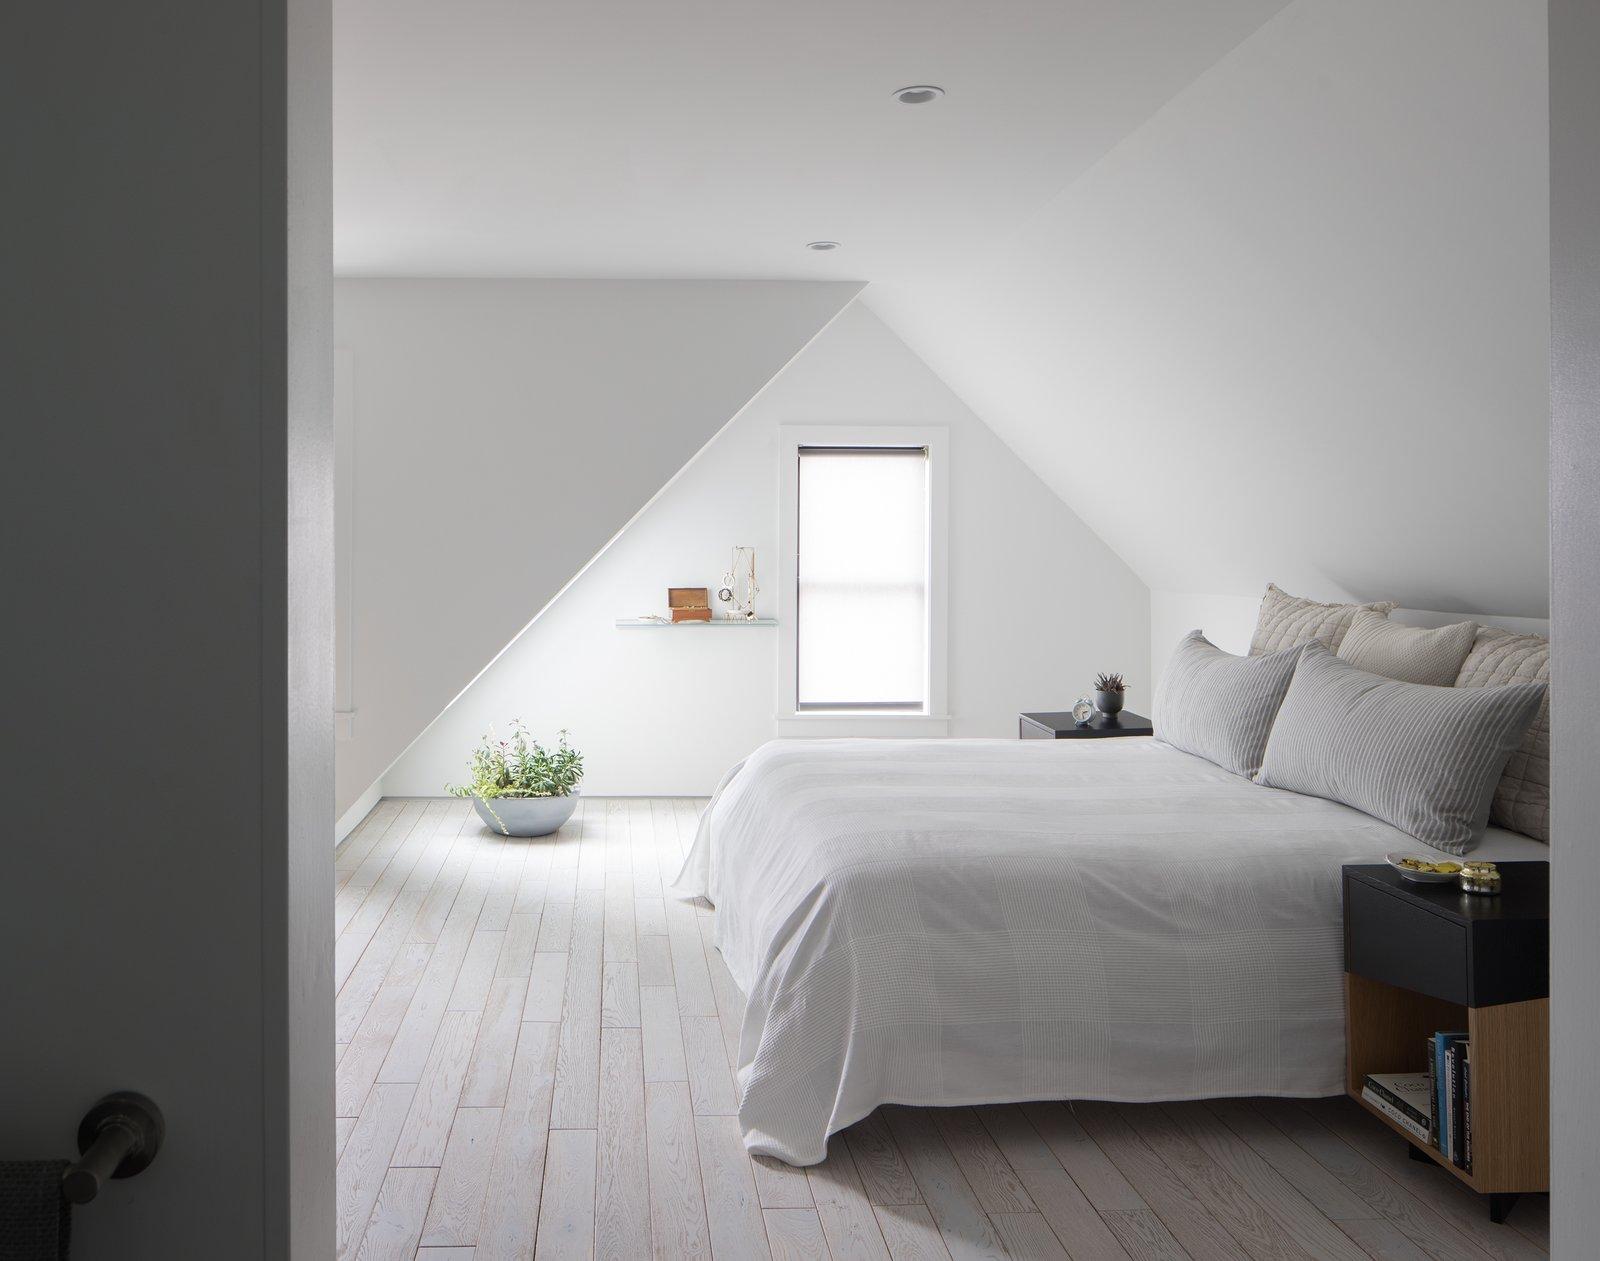 Master Bedroom. Custom night stand by Platform Workshop.  Tagged: Bedroom, Night Stands, Bed, Ceiling Lighting, and Light Hardwood Floor.  Thole Residence by Design Platform